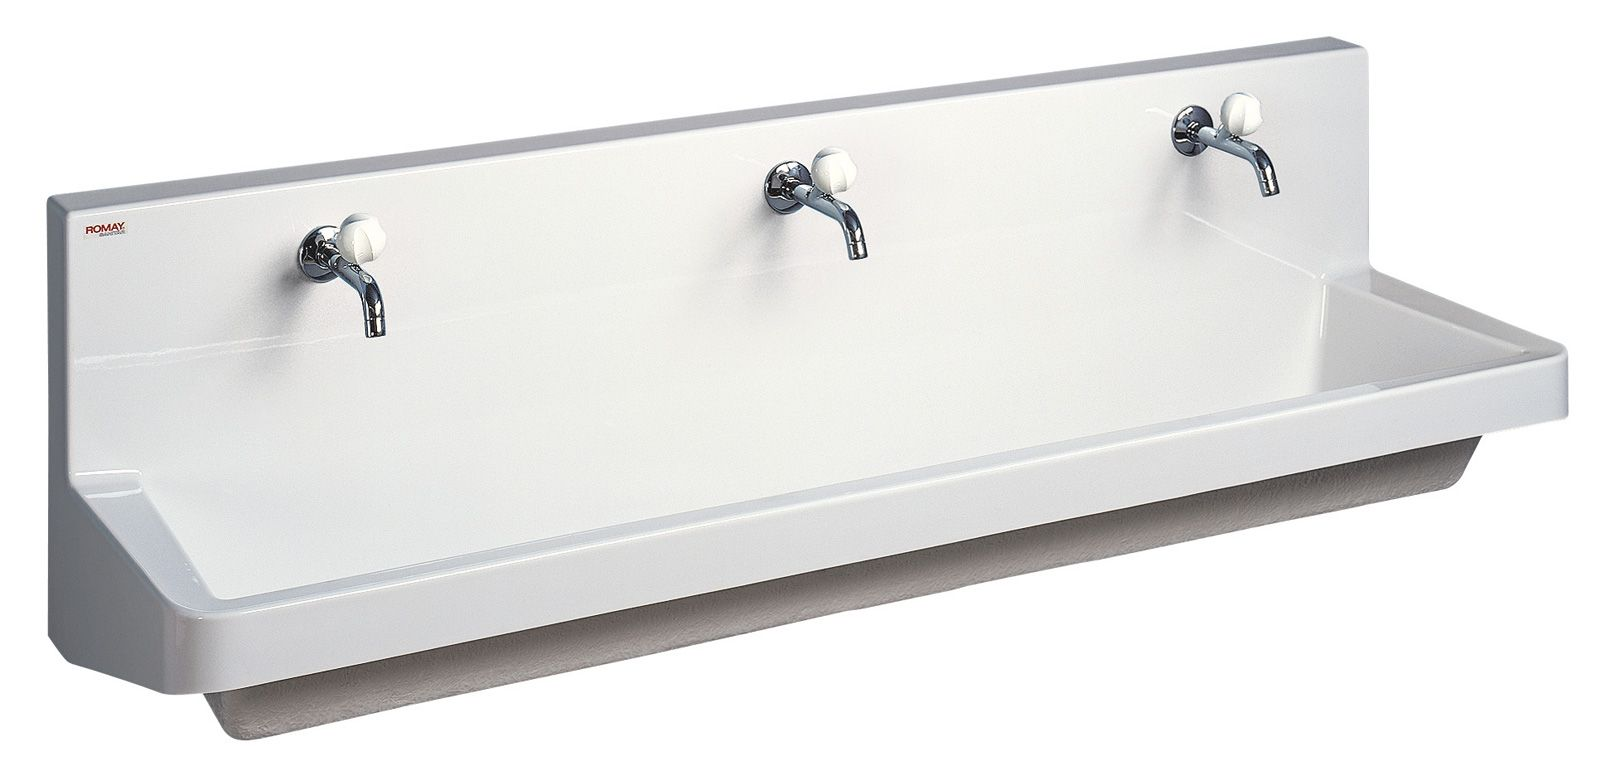 lavabo collectif lavabo rigole jardin d 39 enfants romay espace aubade salle de bain. Black Bedroom Furniture Sets. Home Design Ideas